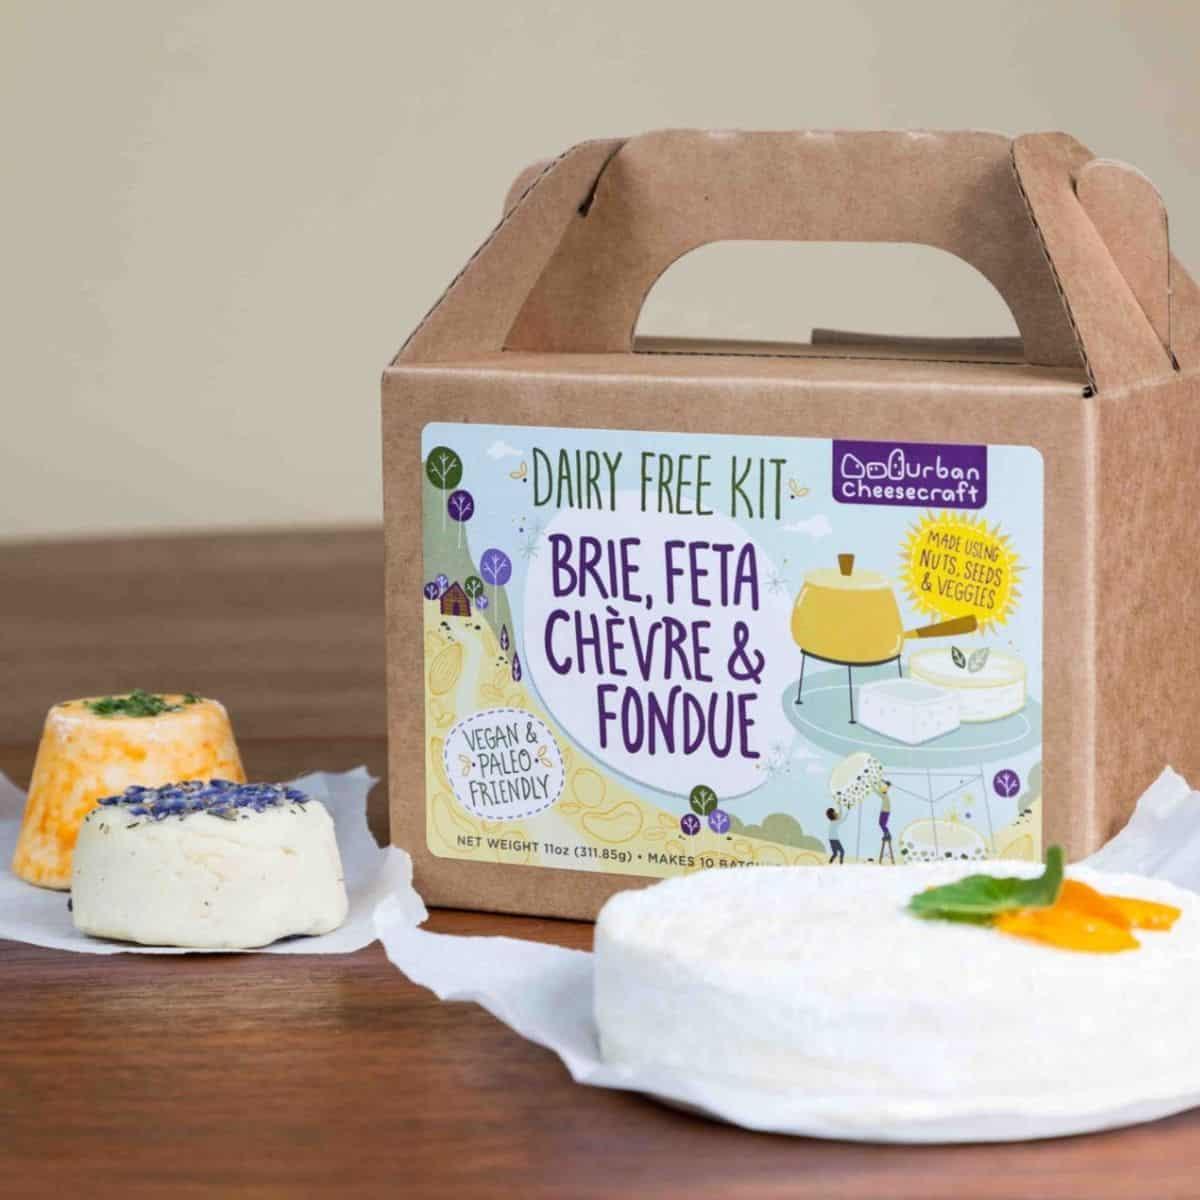 Dairy Free Kit to make Brie, Feta, Chevre, and Fondue